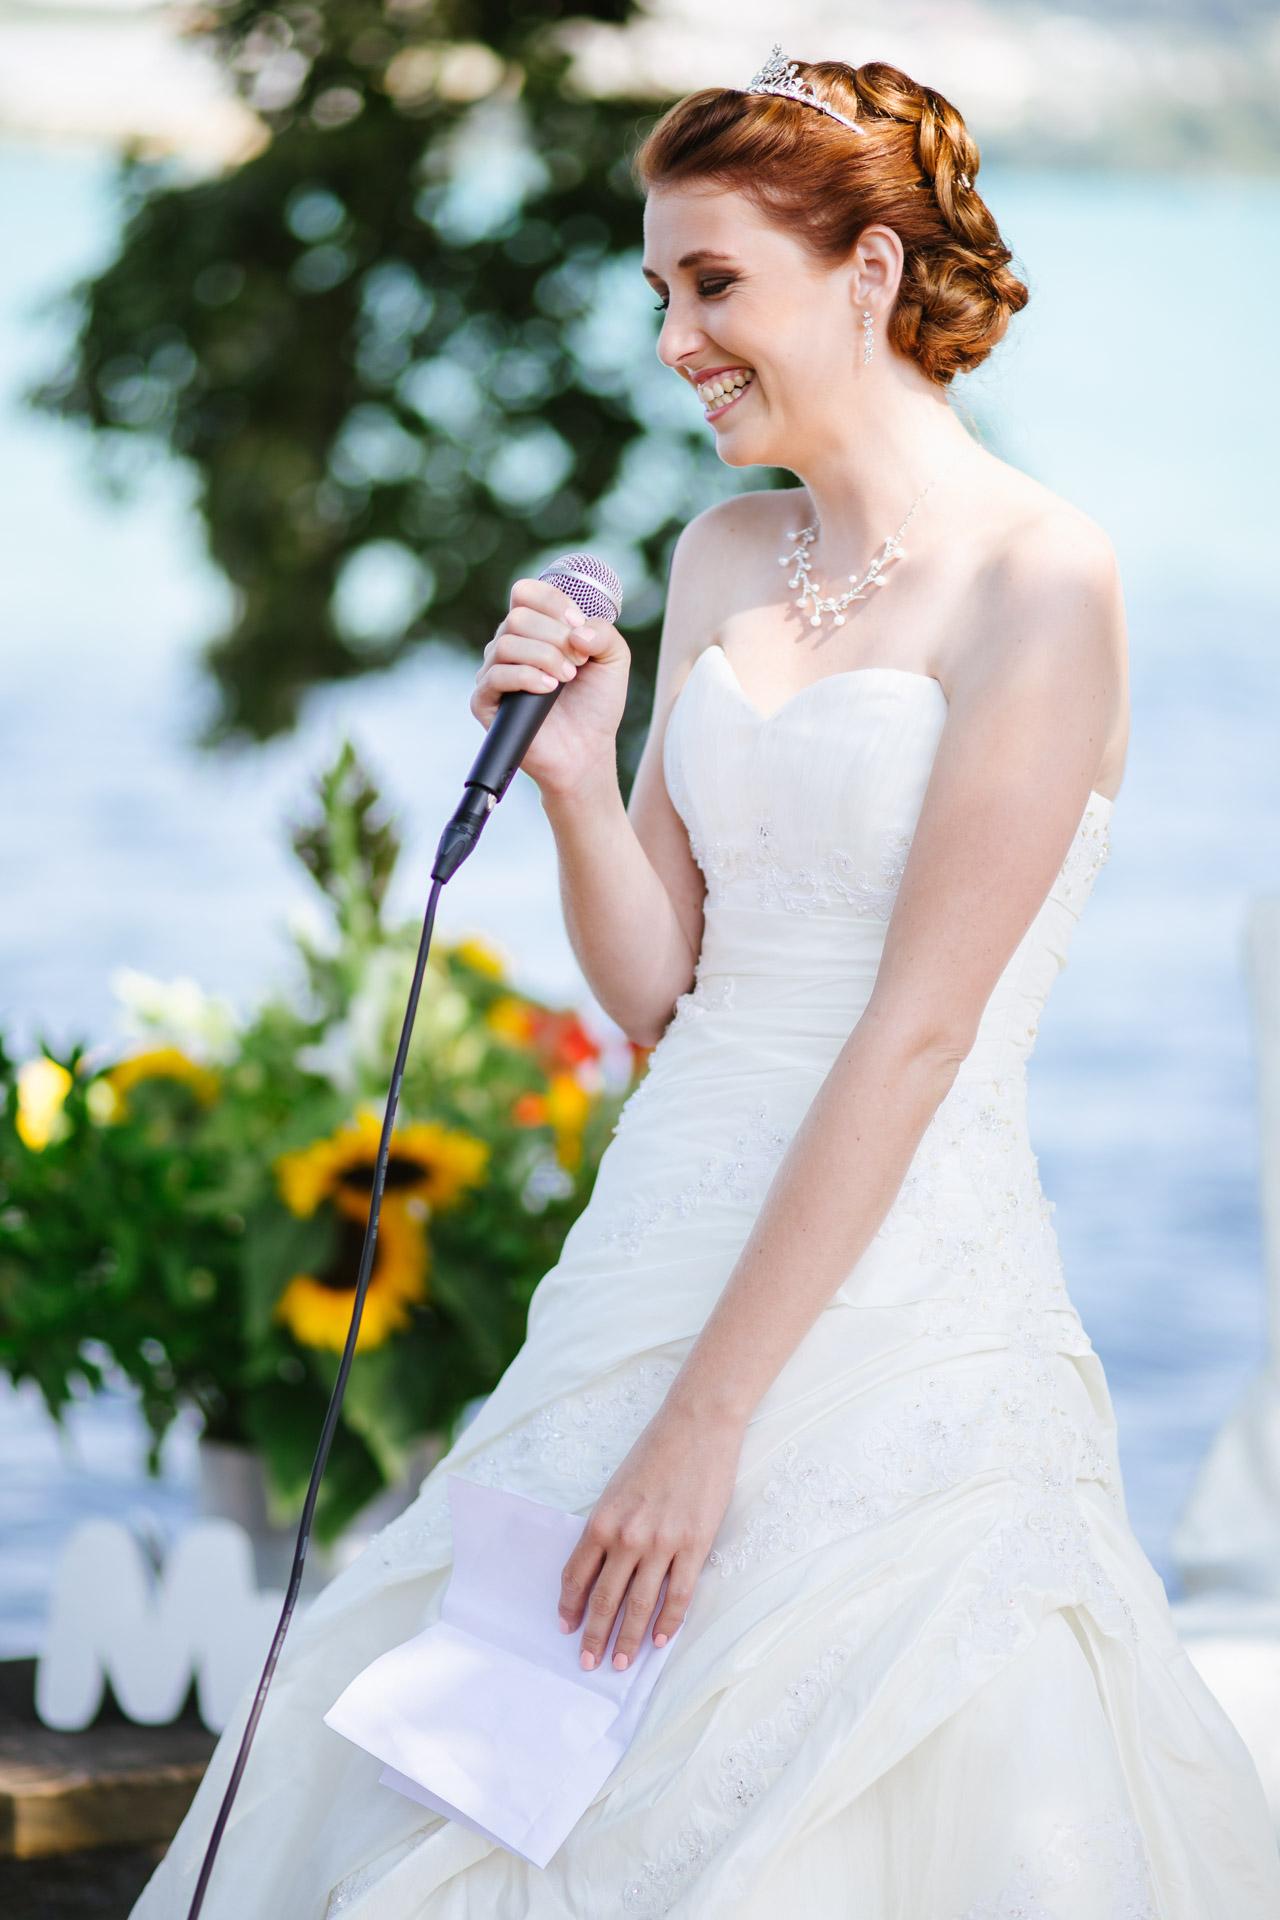 Pixelart_Hochzeitsfotografen_Loerrach_Rheinfelden_Hallwil_Schweiz_Linda-Ramon-1035